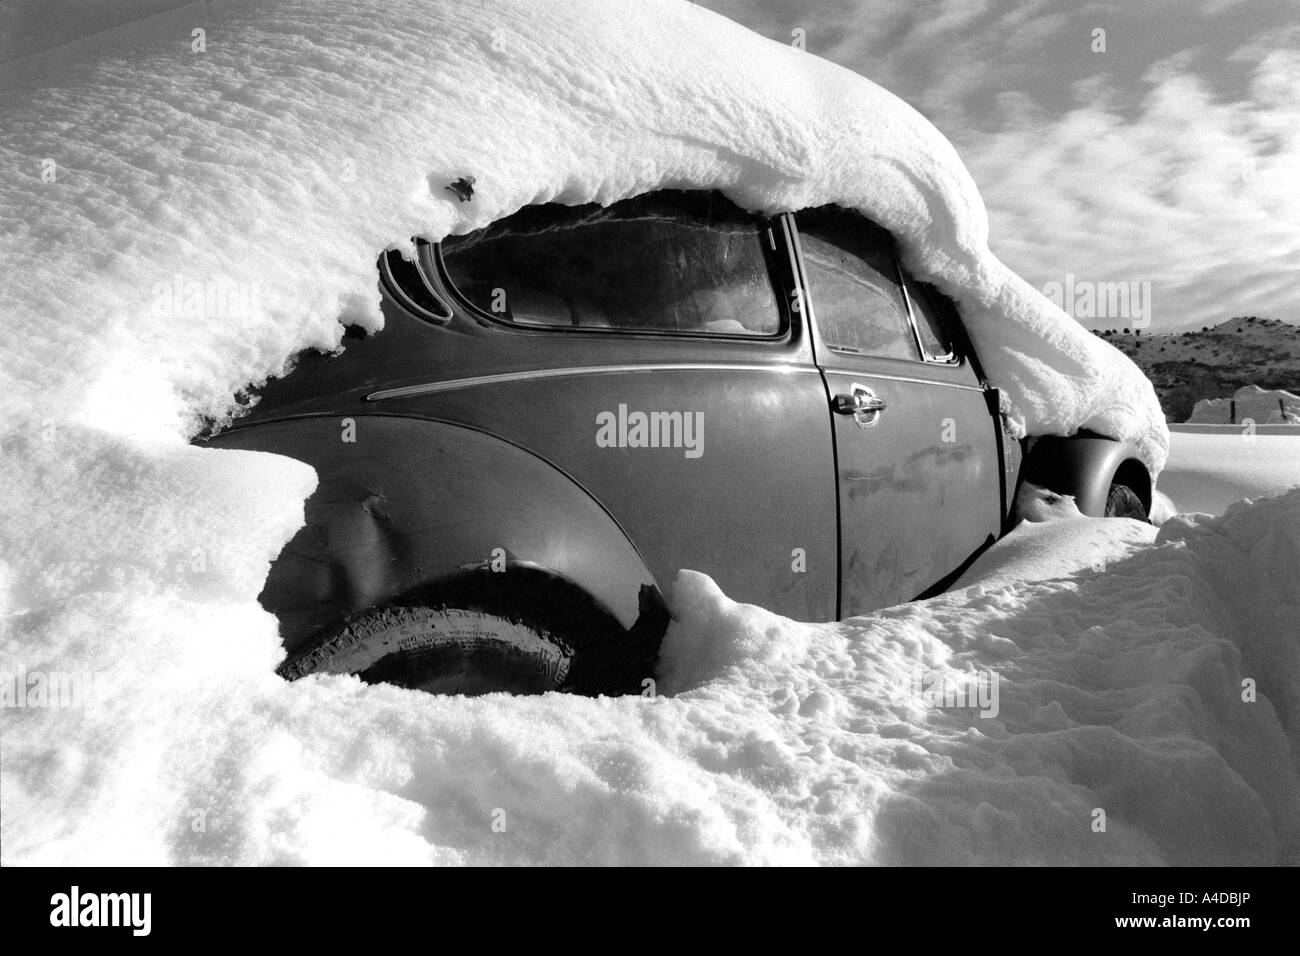 'Colorado beetle' Pun for VW Beetle taken in Colorado - Stock Image